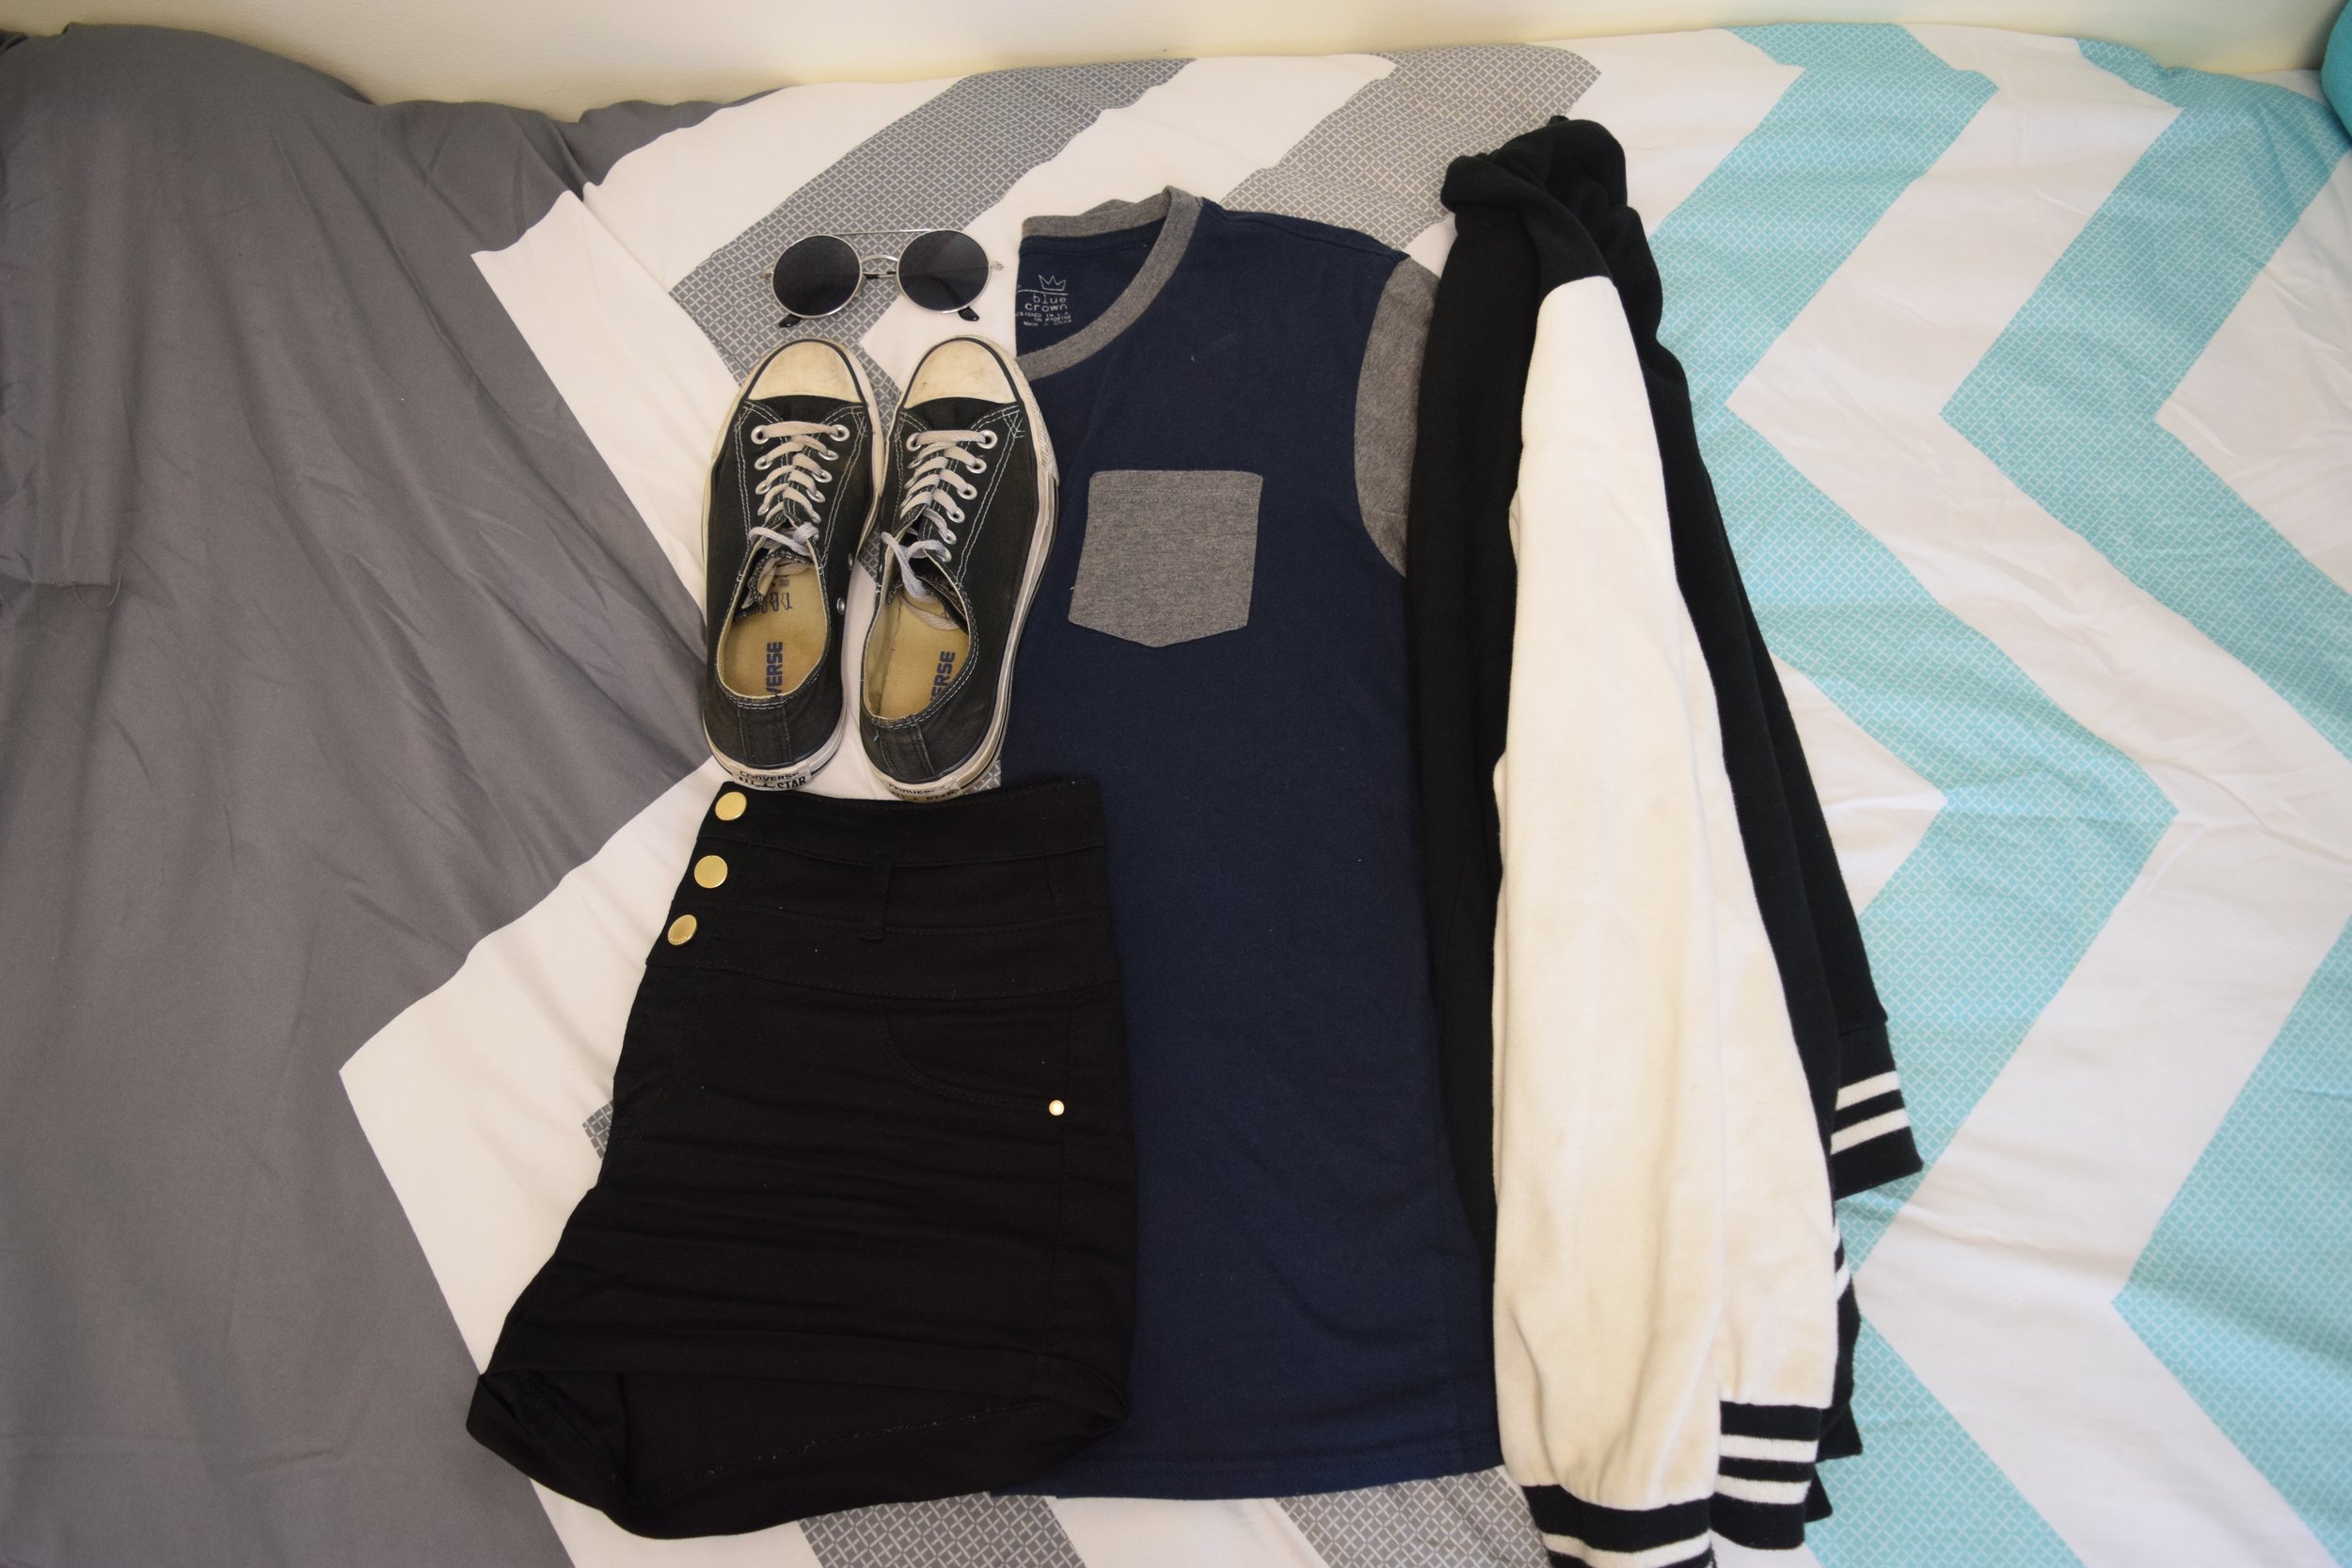 Shirt .  Shorts .  Jacket  (similar).  Sneakers .  Sunglasses  (similar).